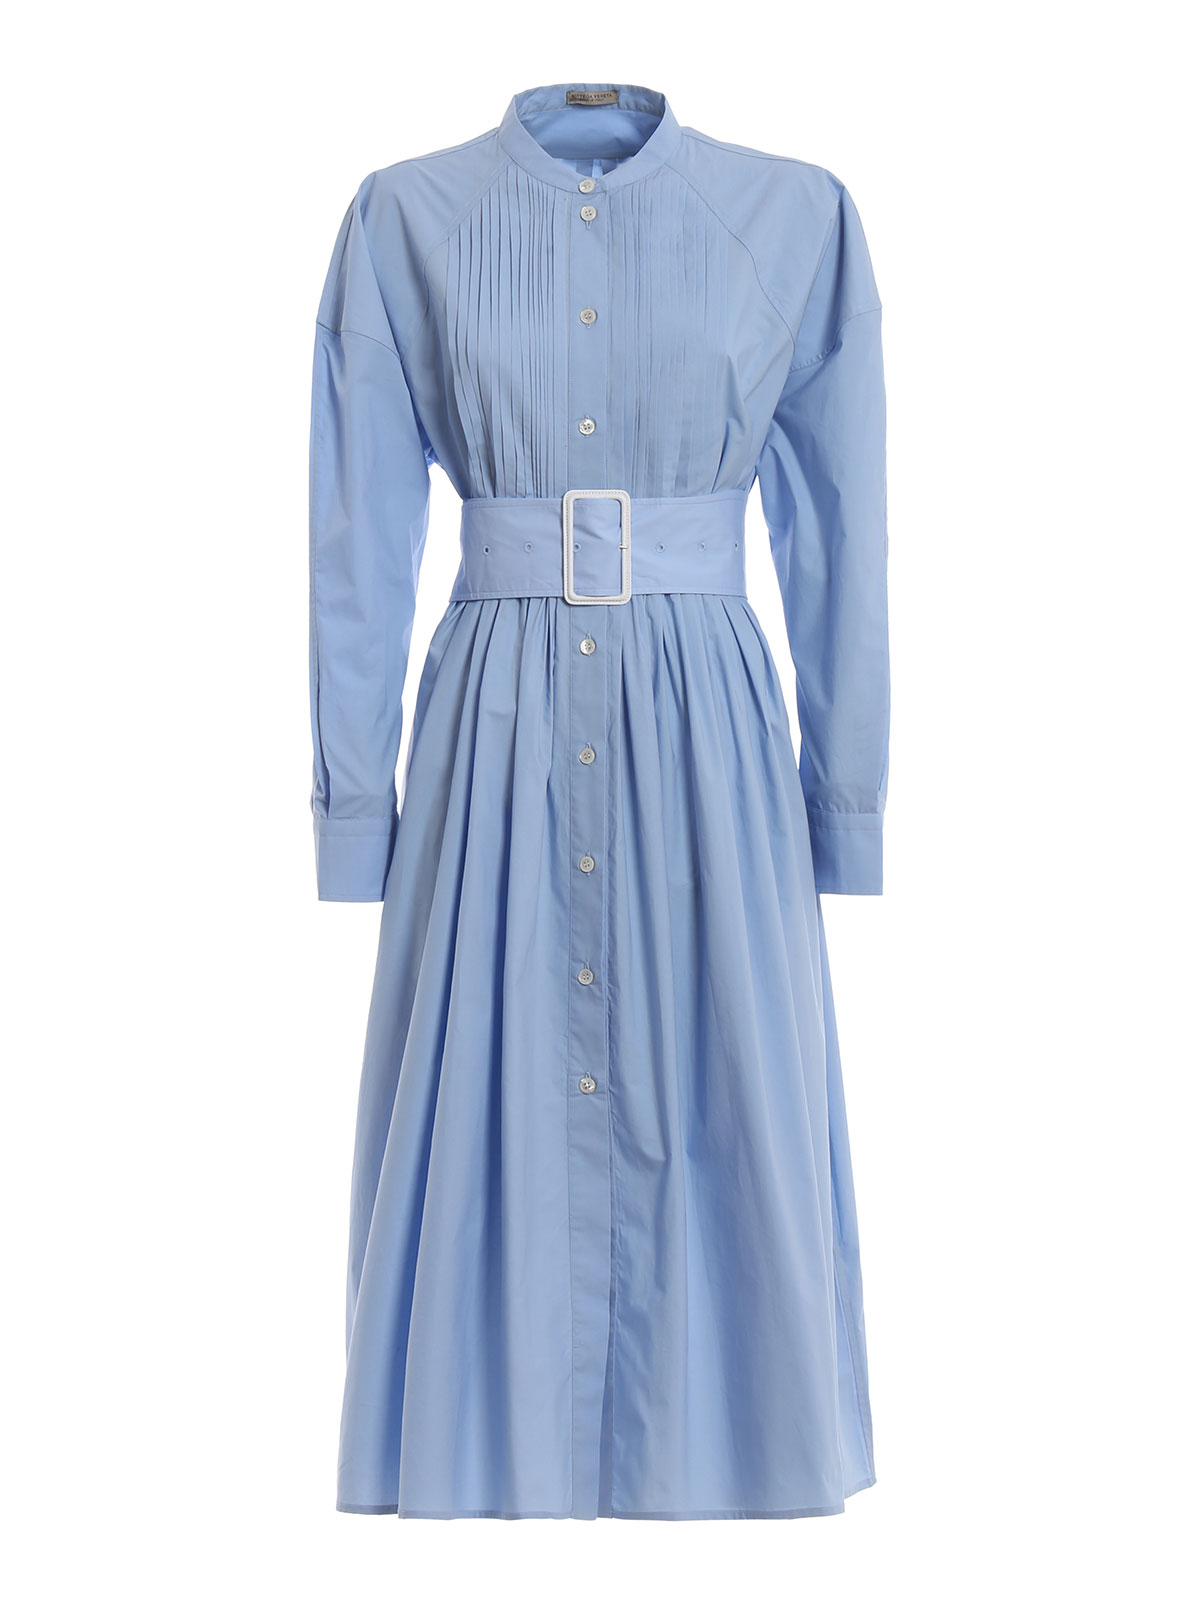 Bottega Veneta - Knielanges Kleid - Hellblau - Knielange Kleider